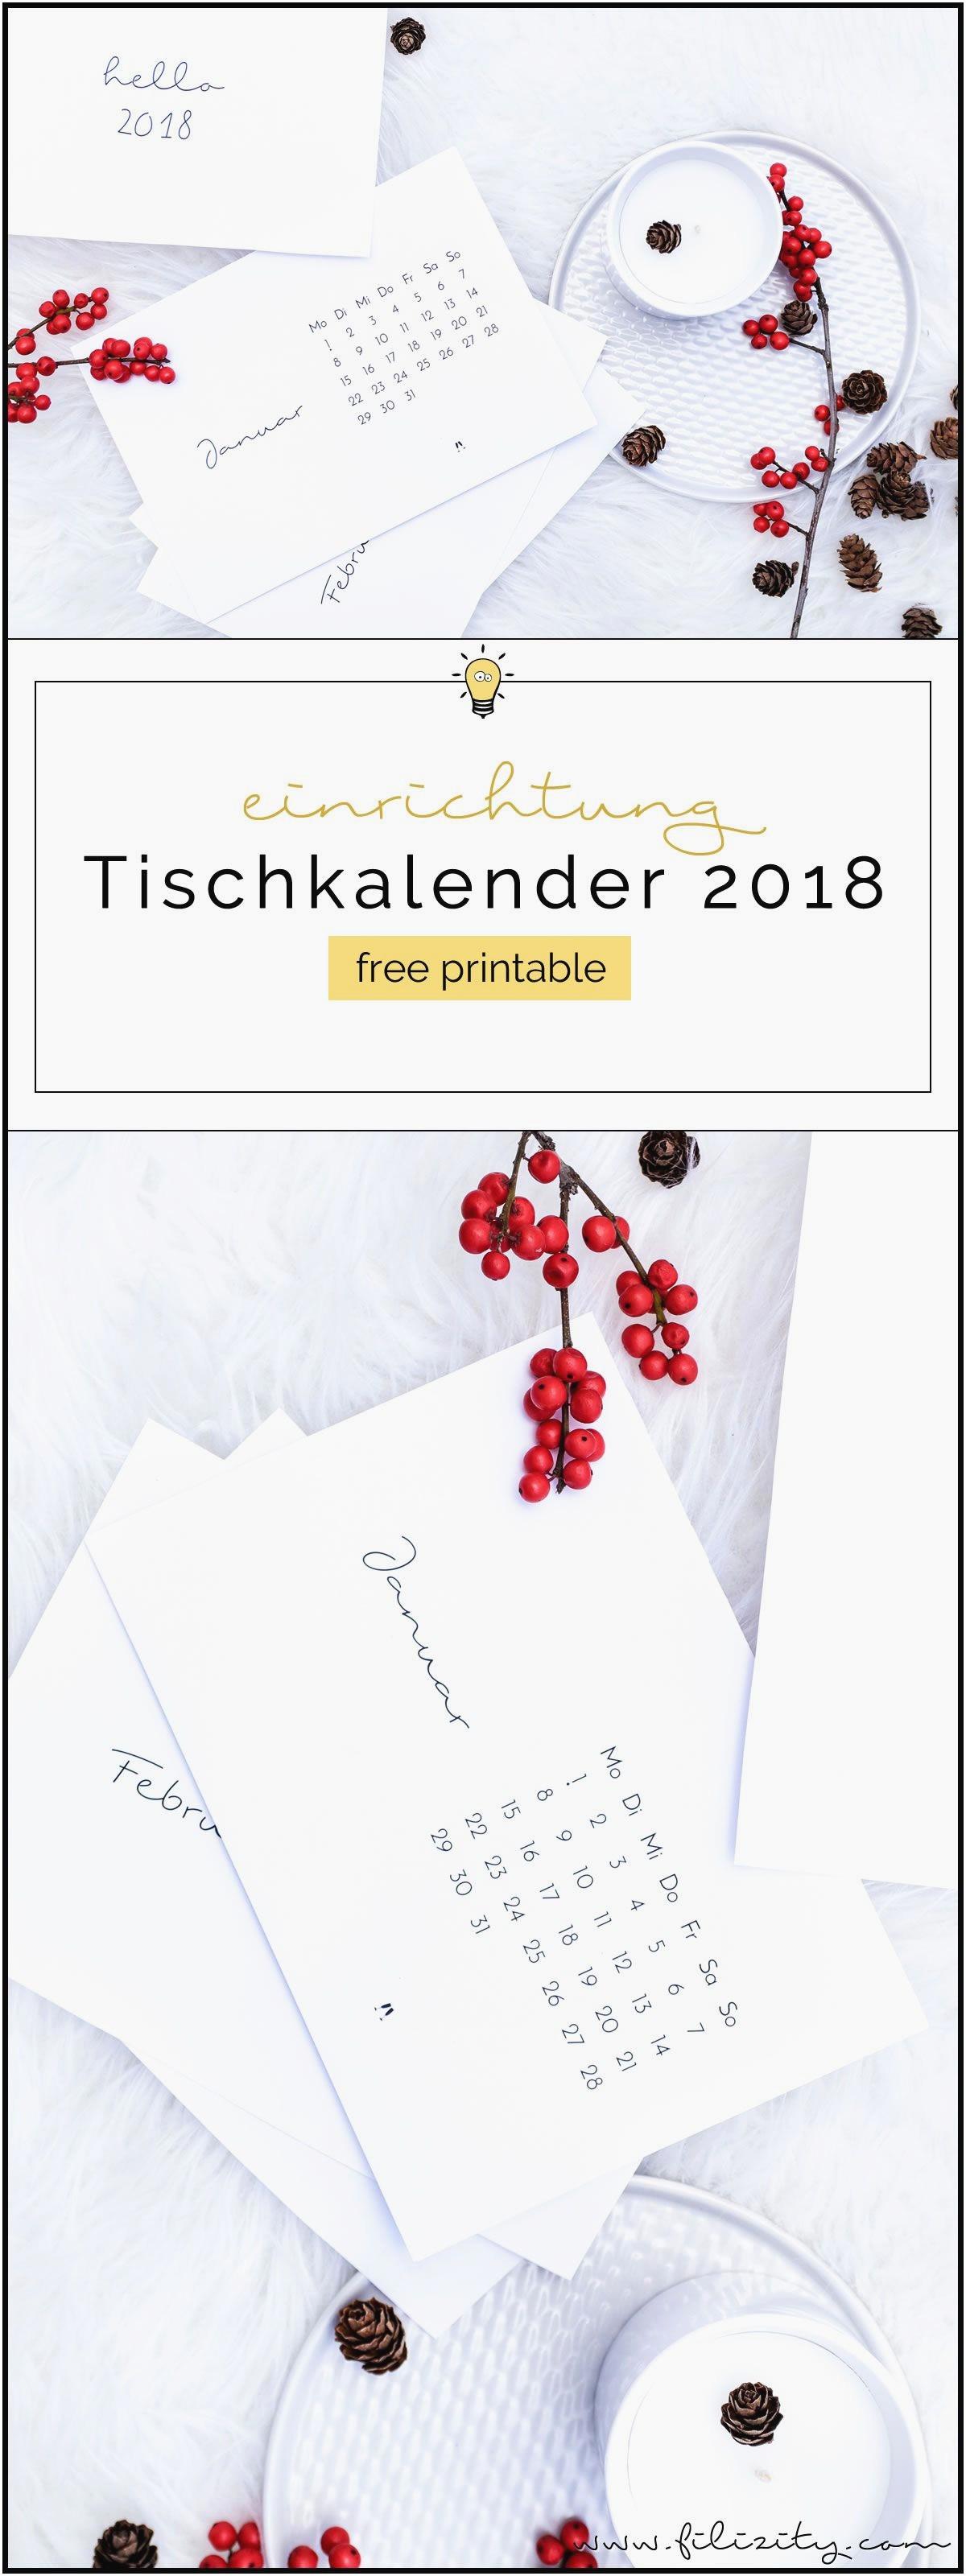 Fiscal Year Calendar 2019 Excel Más Recientemente Liberado Kerstinsudde Of Fiscal Year Calendar 2019 Excel Más Reciente 2019 Calendar Template Excel Glendale Munity Document Template